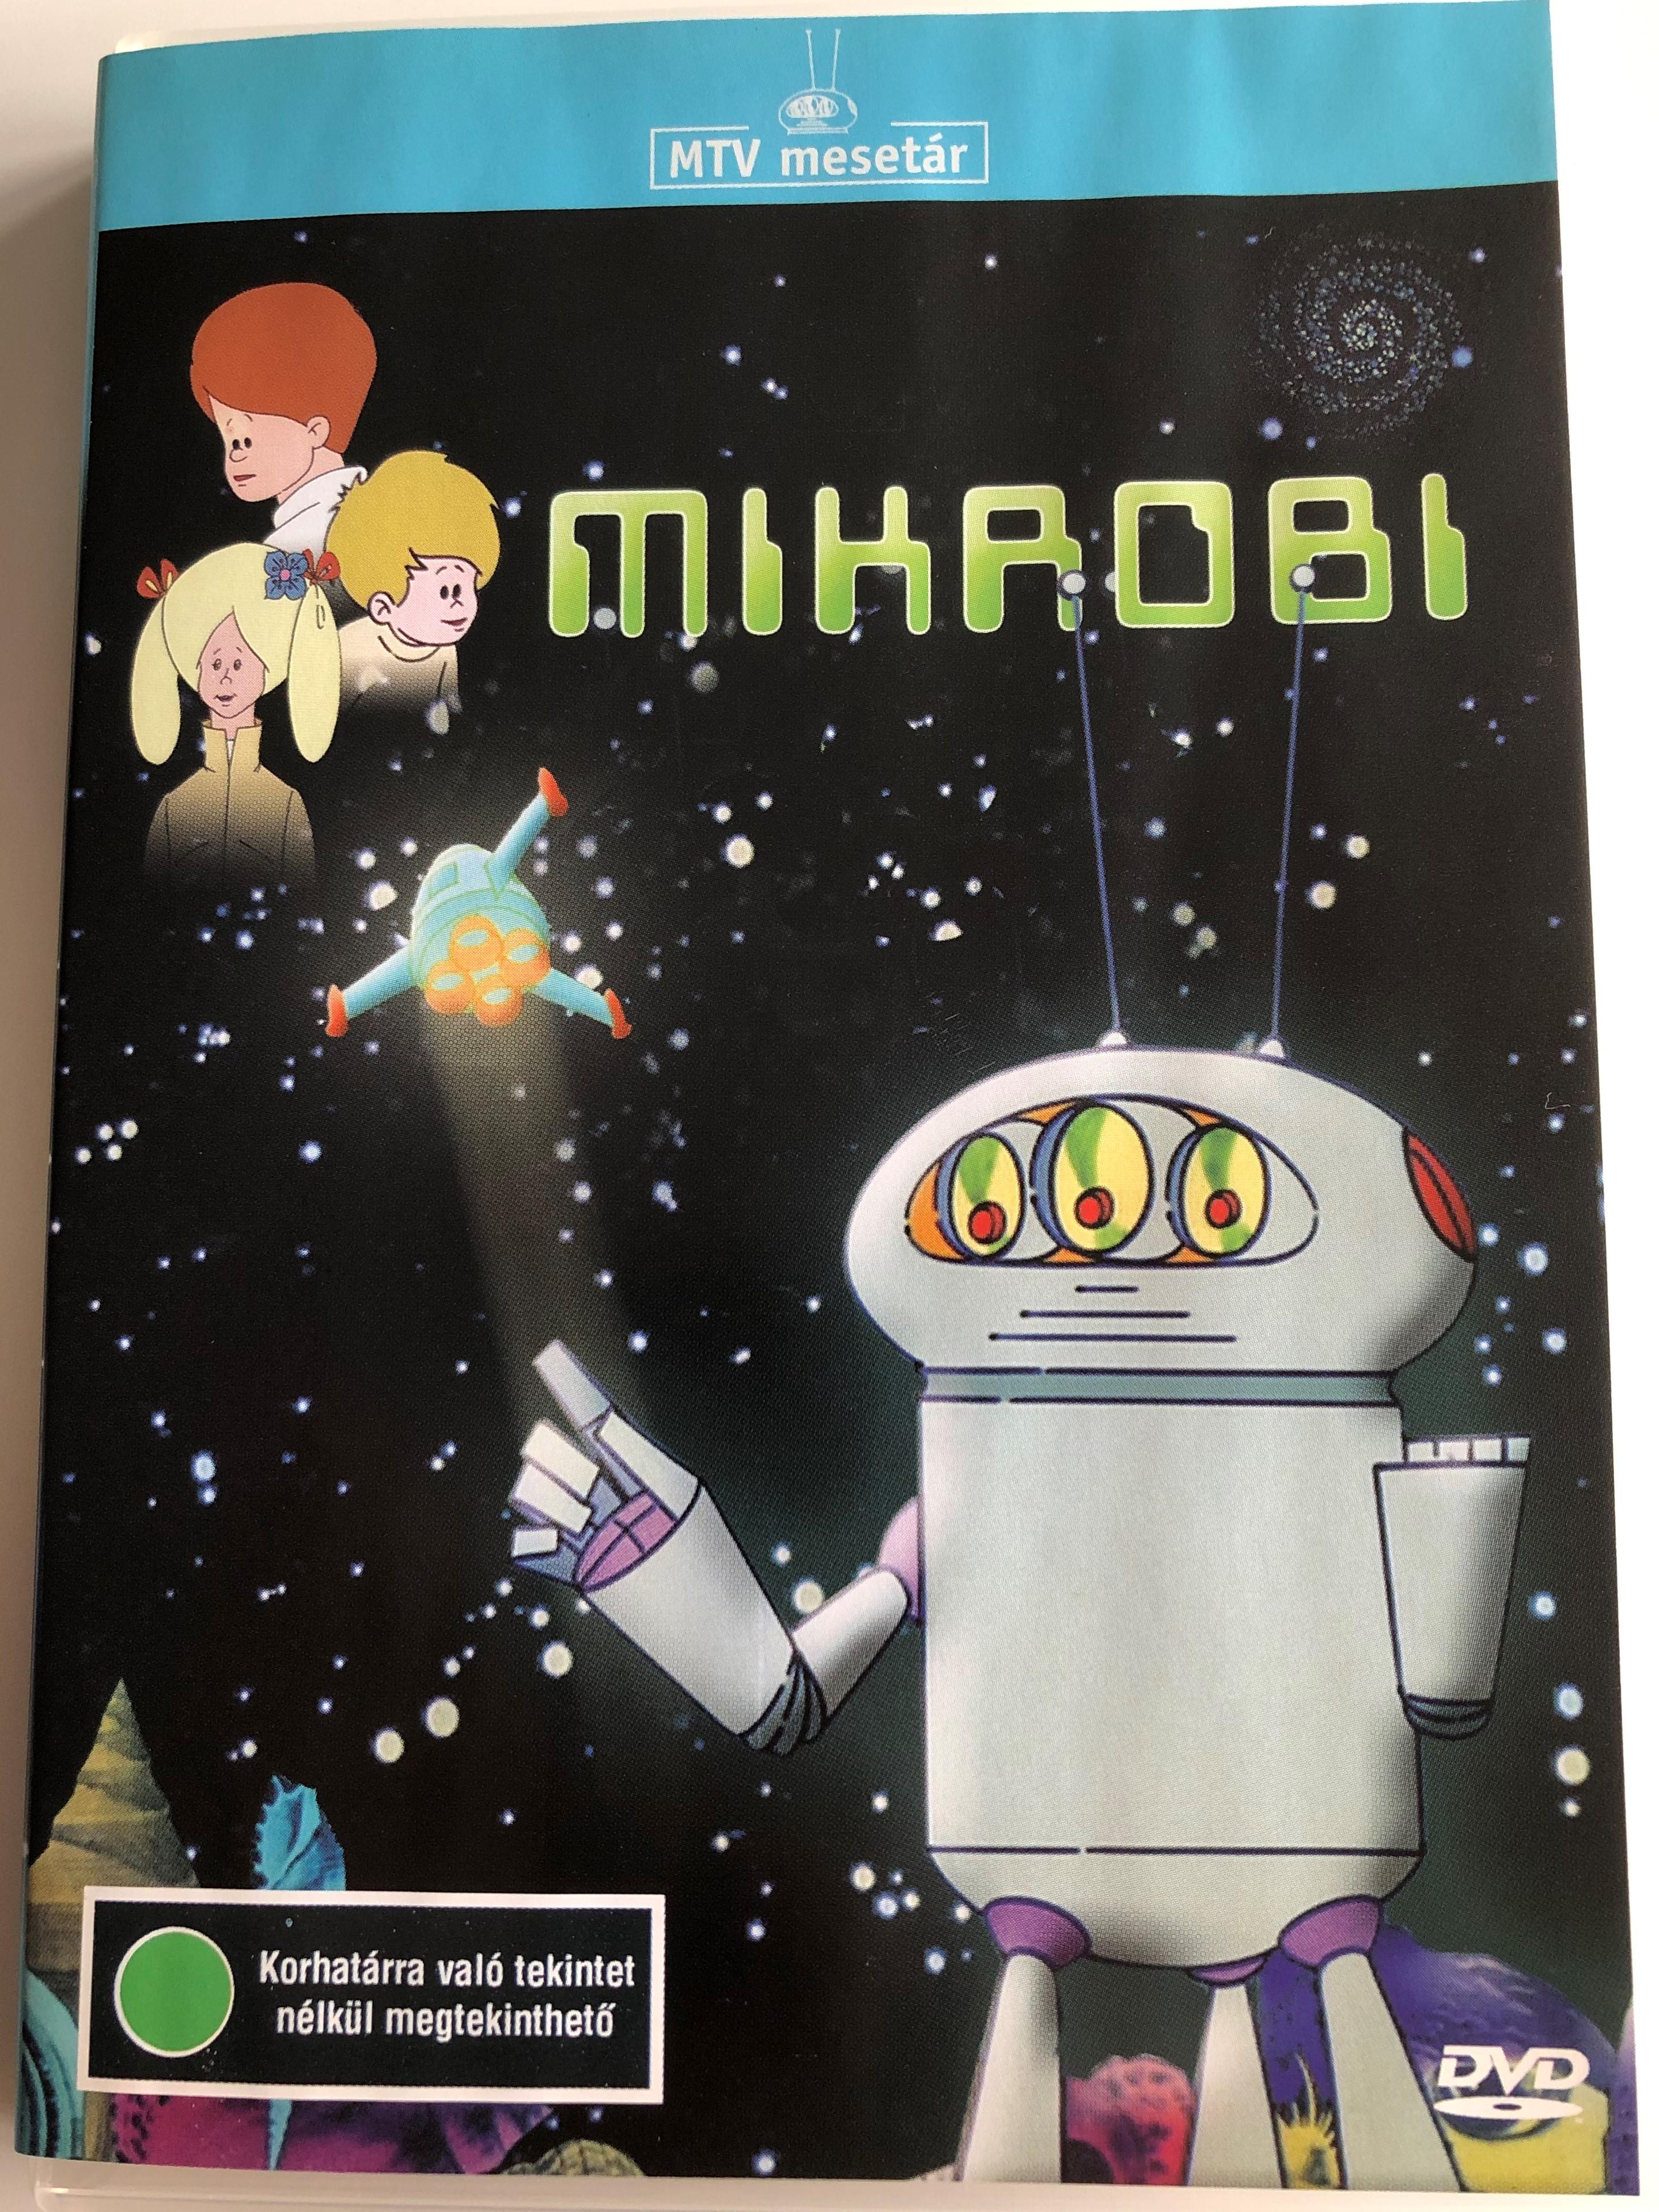 mikrobi-hungarian-animated-series-dvd-1975-1.jpg